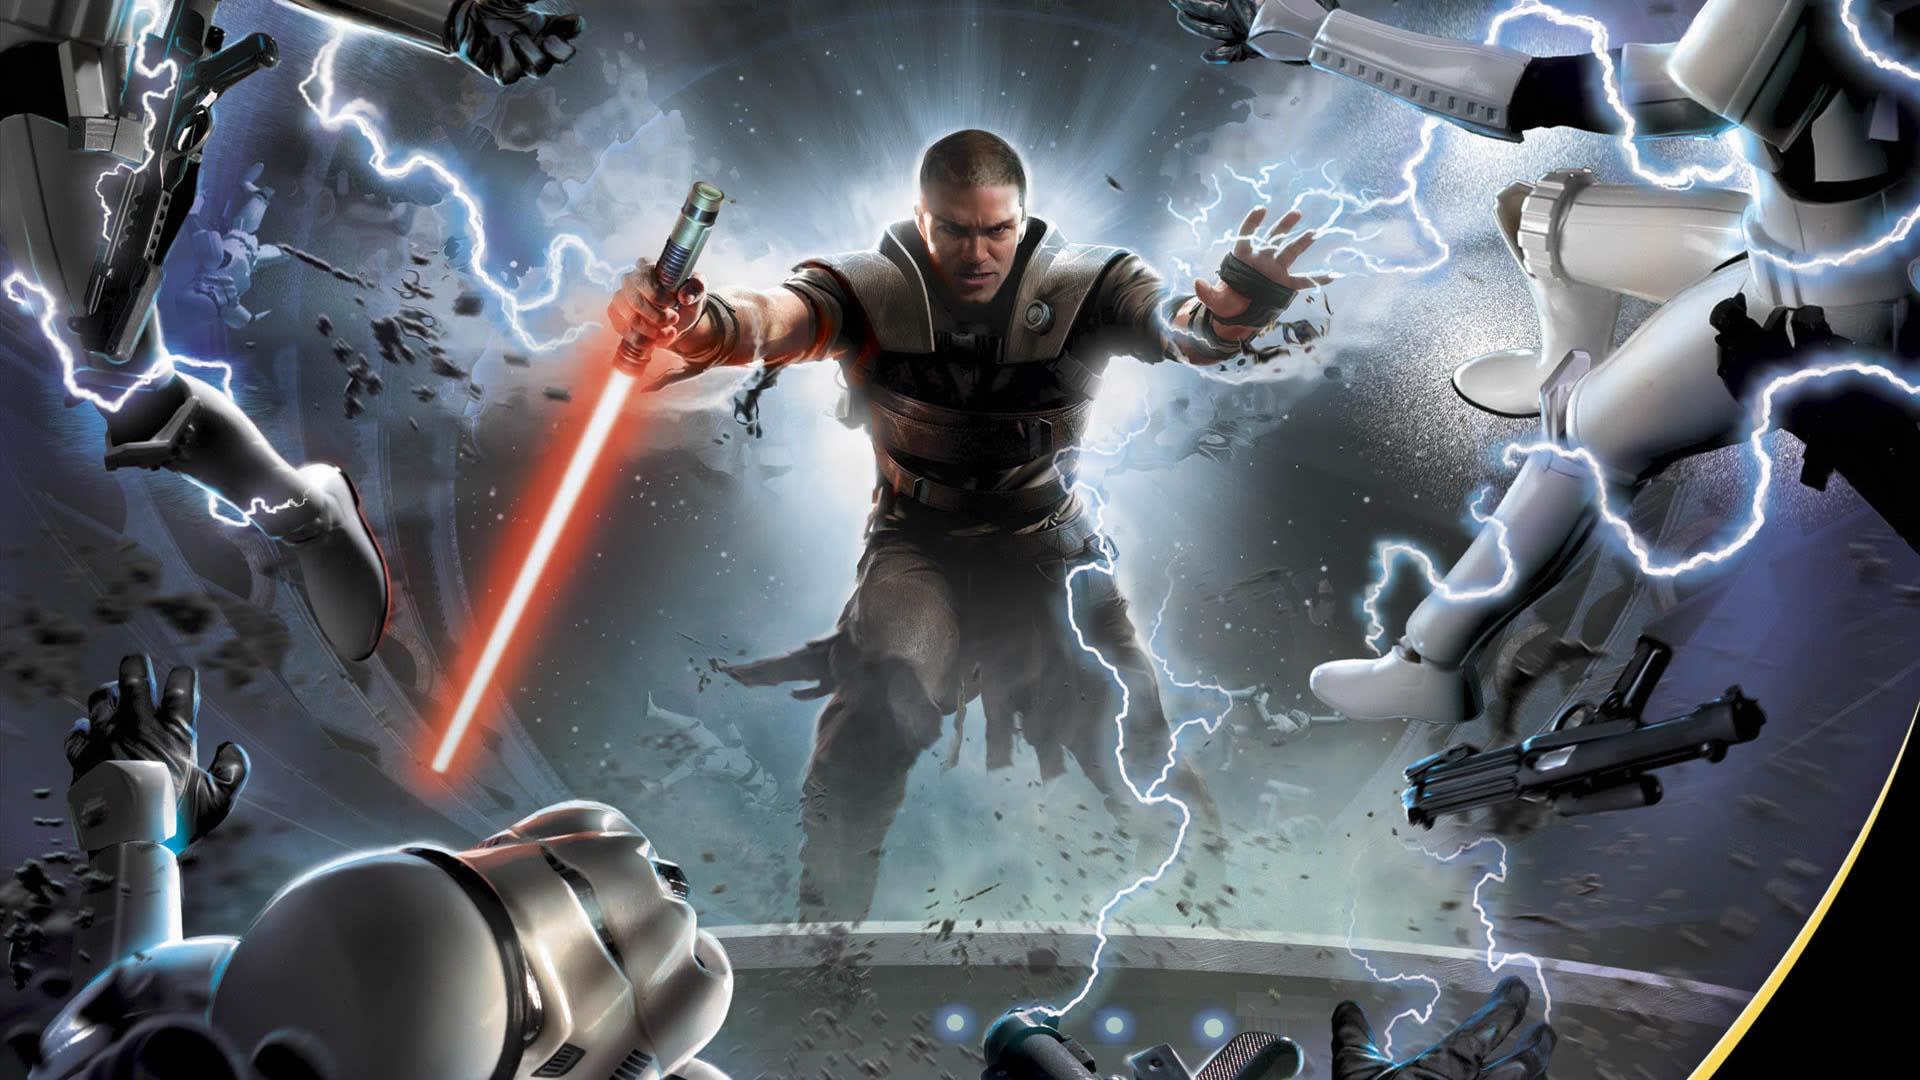 Star Wars Wallpaper 1366x768 Posted By Ryan Mercado